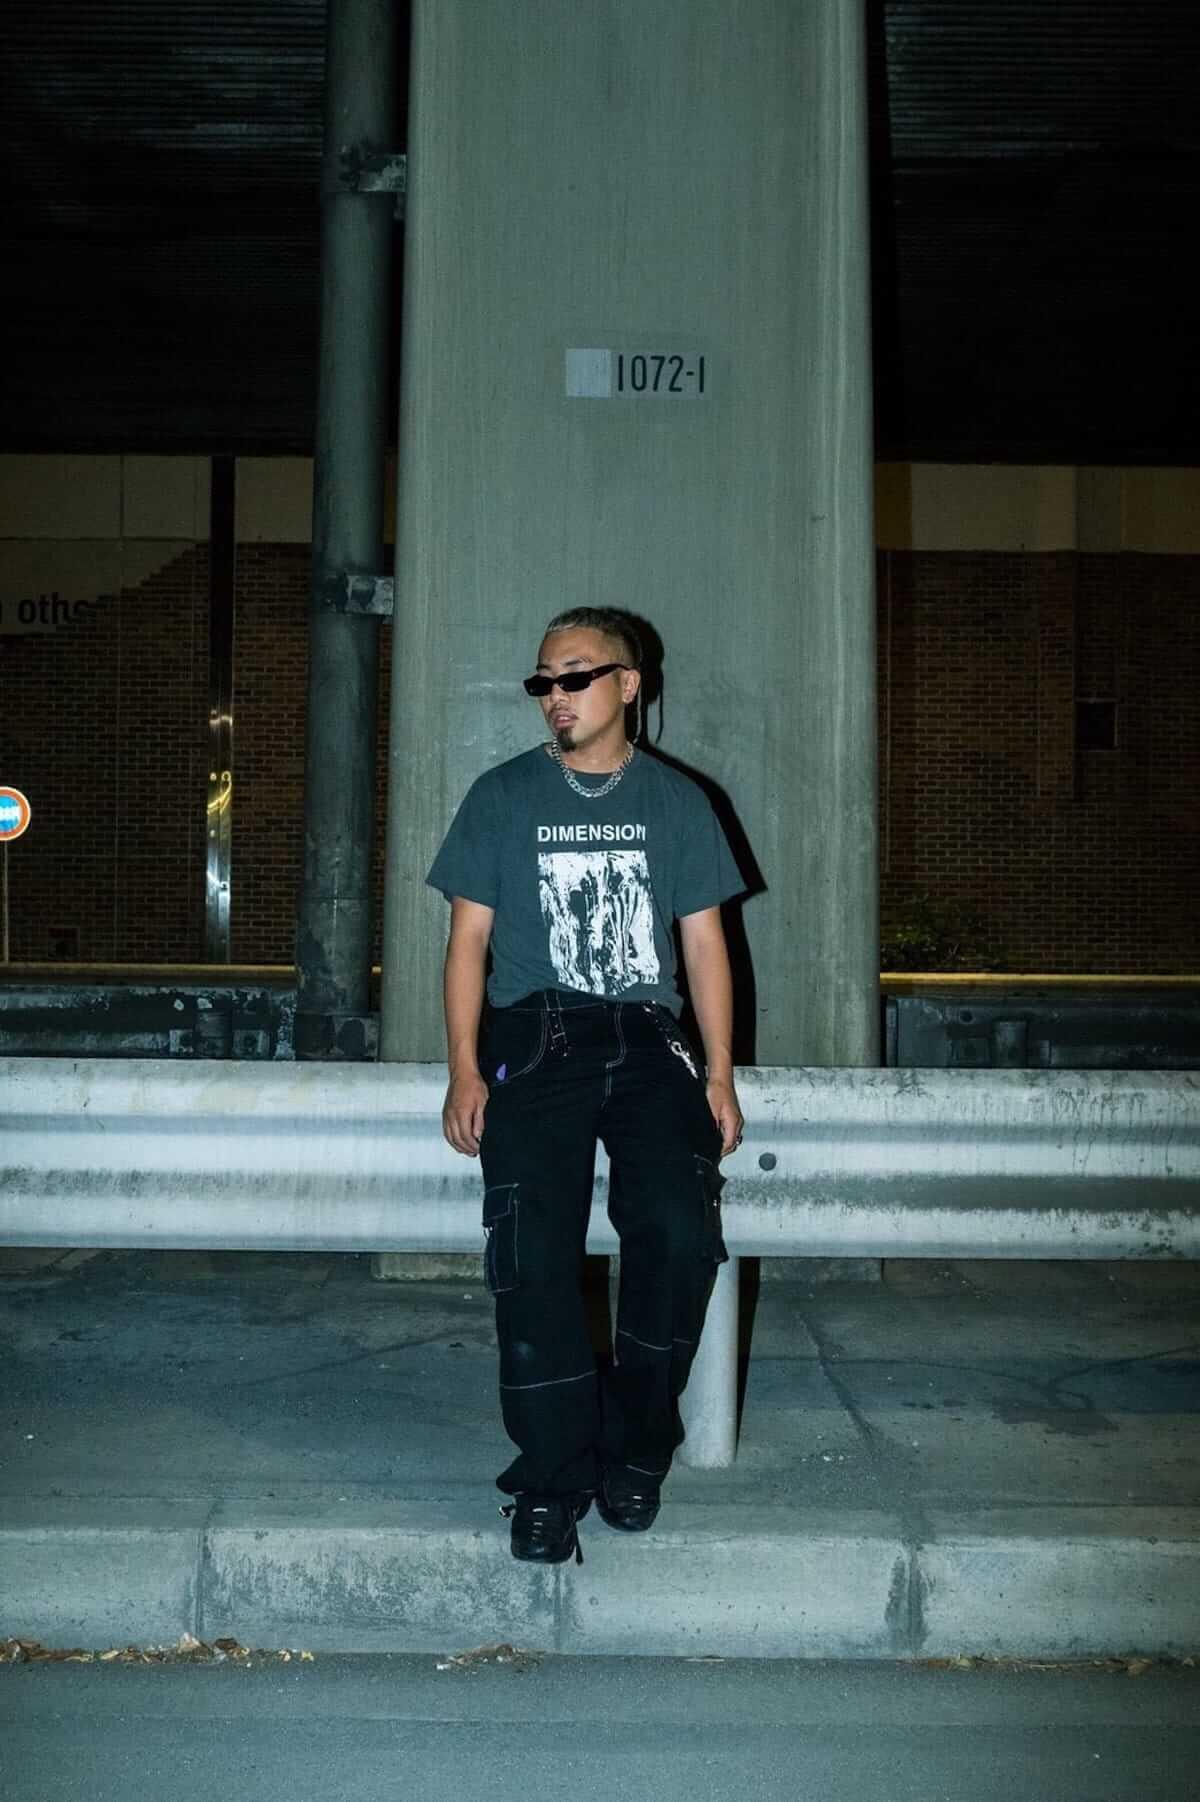 kZmがSpikey John監督の「Wolves feat. 5lack」MVを公開|<YENJAMIN>会場ではCreativeDrugStoreとのコラボグッズも music180717_kzm_4-1200x1802